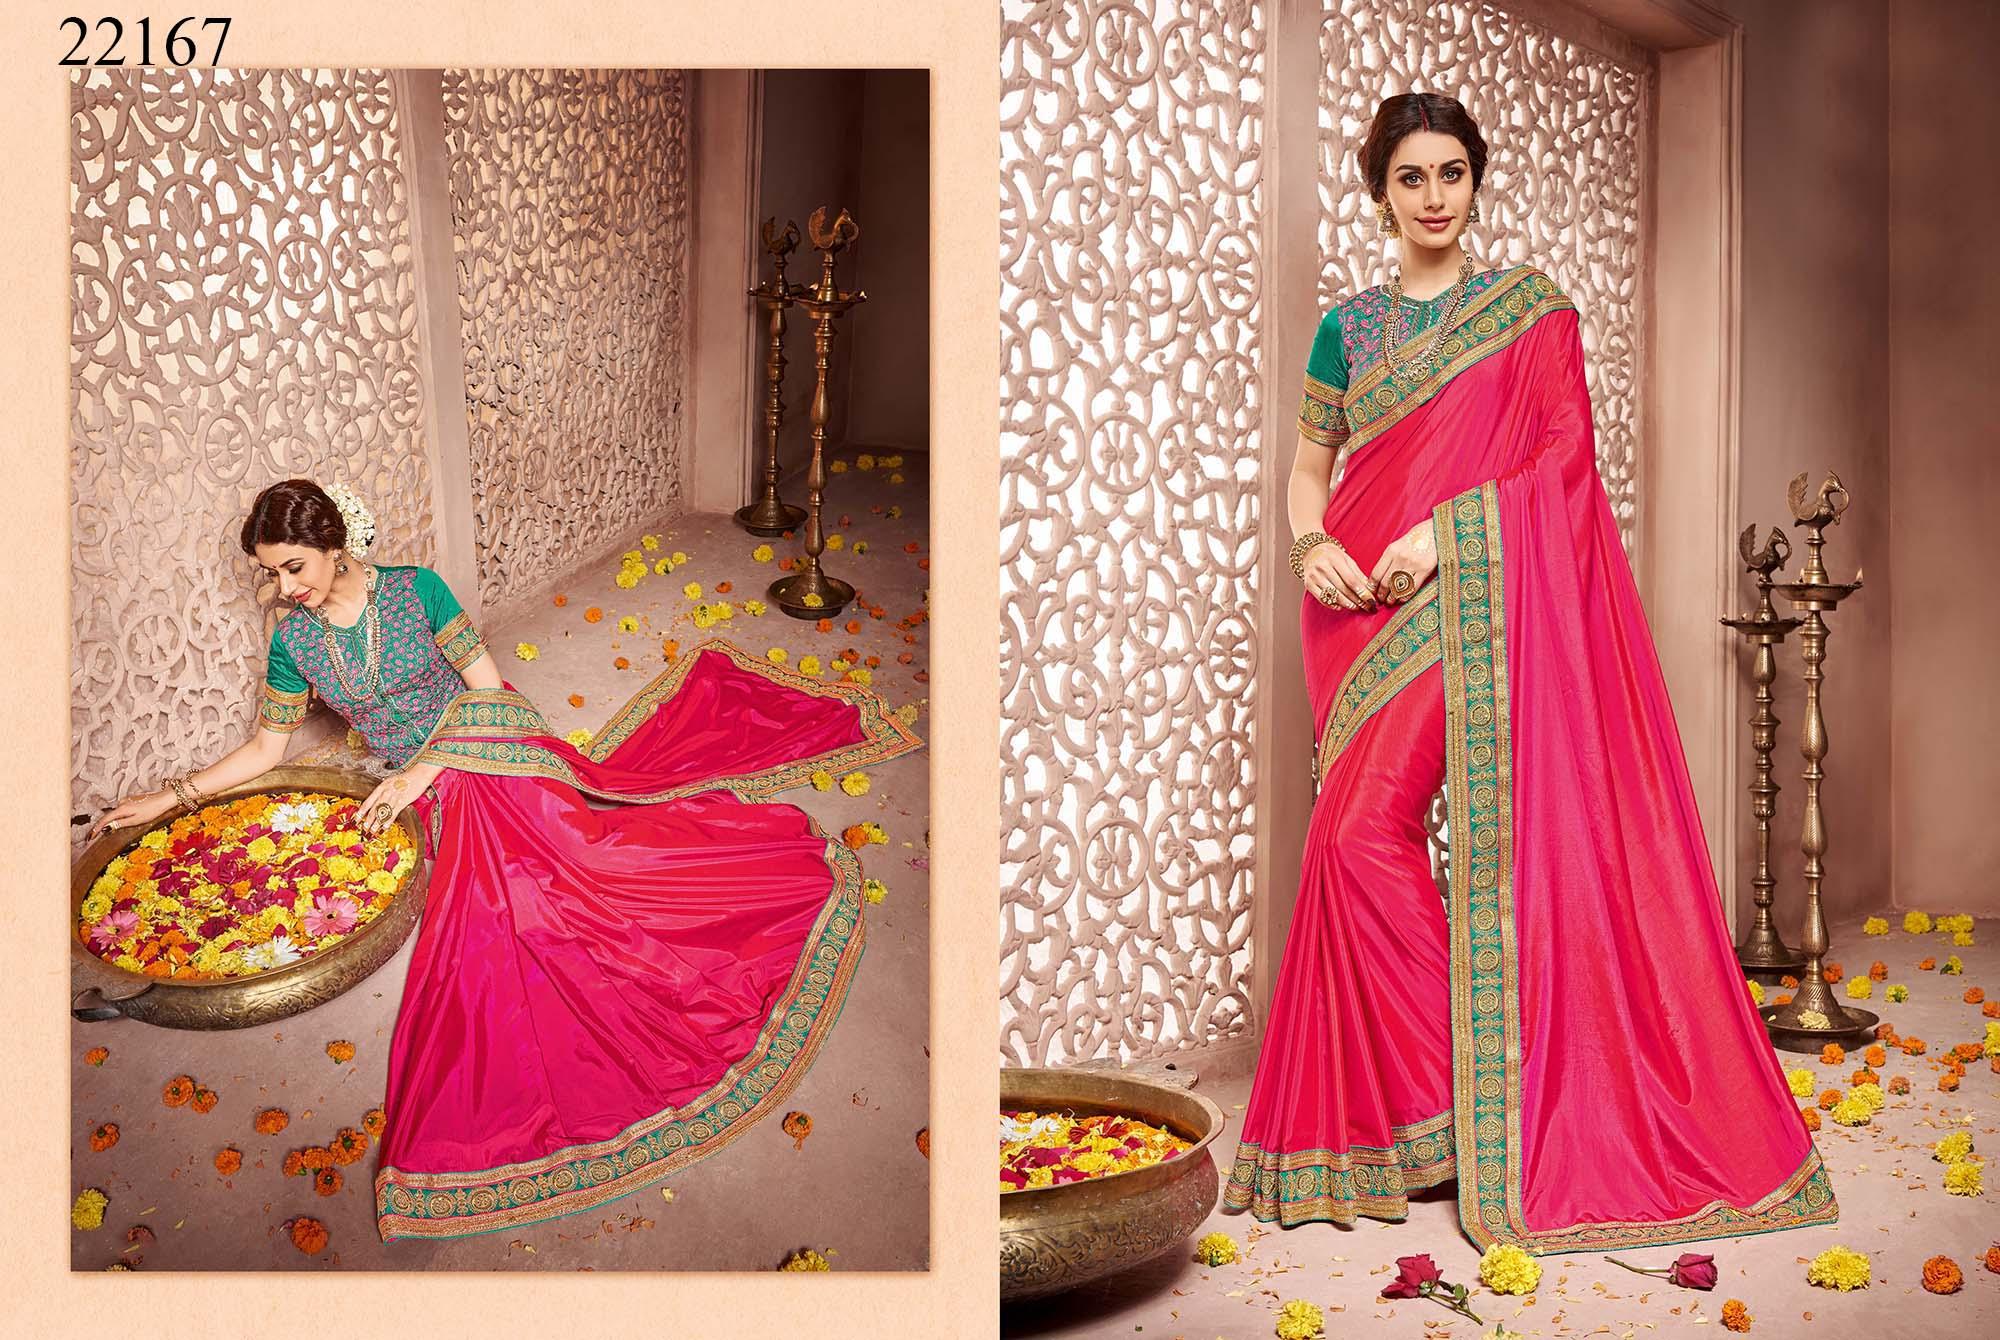 Newly Wedded Bridal Saree Dania 22167   Bride Special